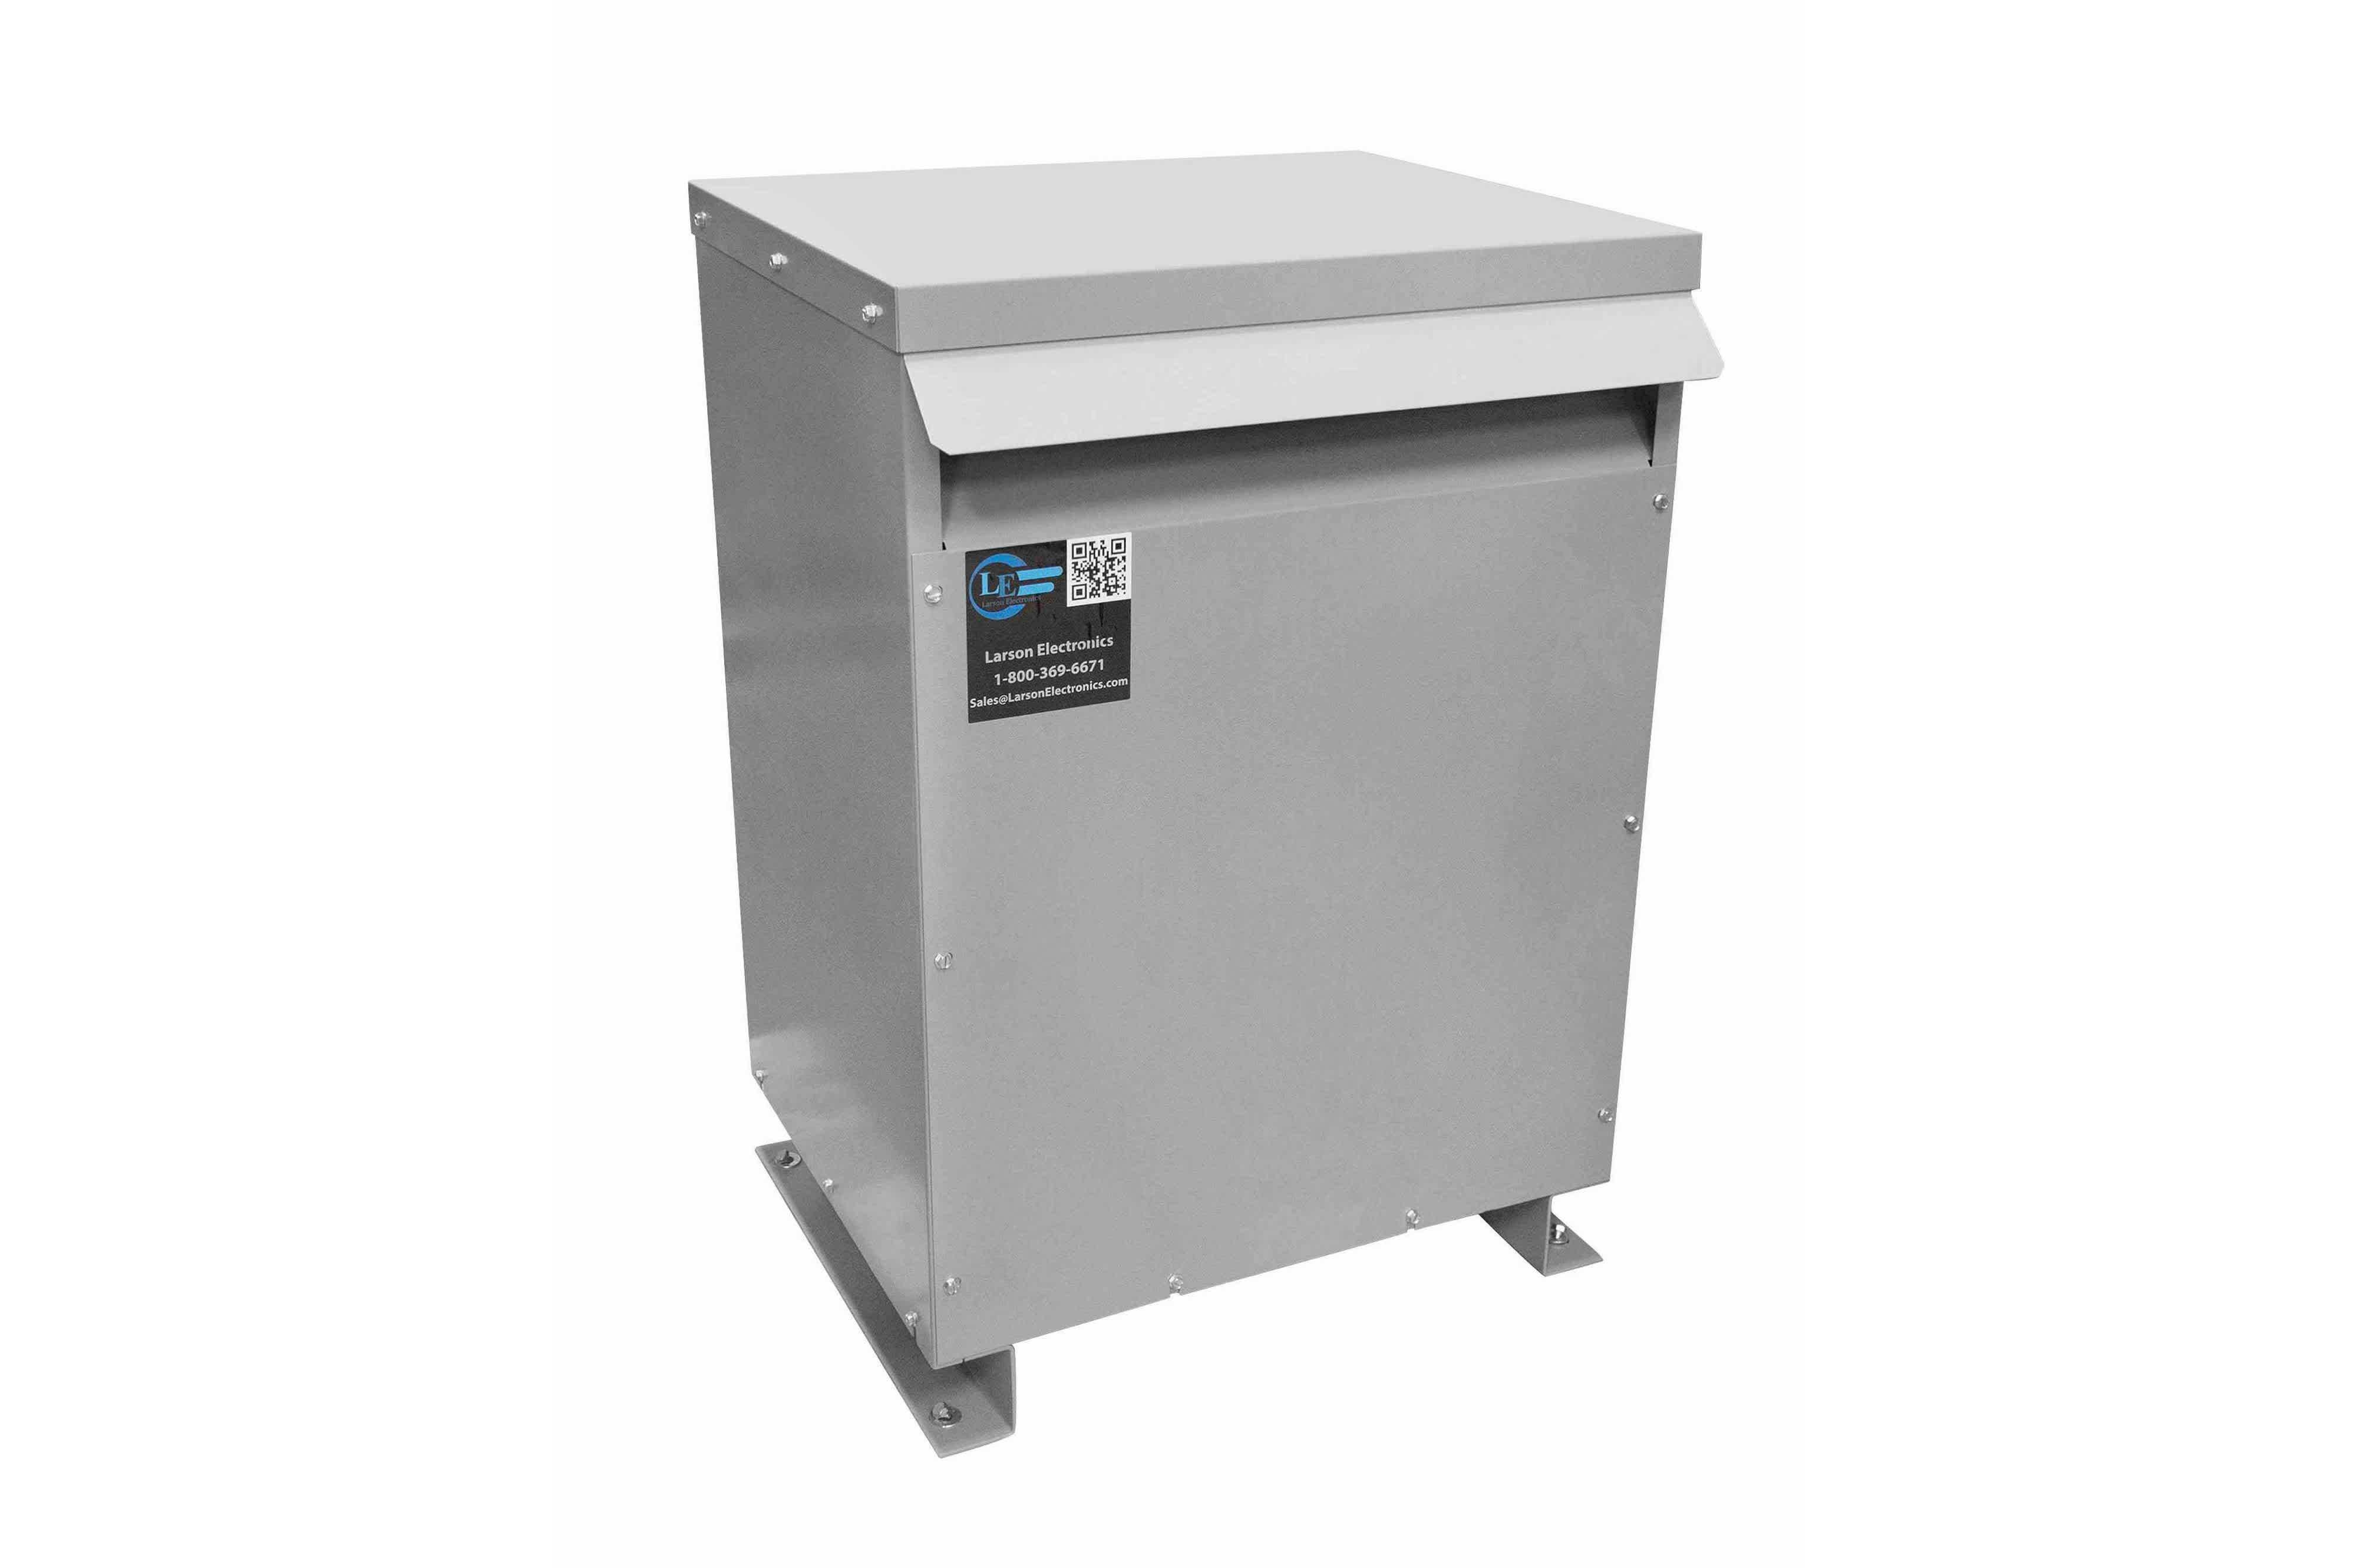 15 kVA 3PH Isolation Transformer, 208V Wye Primary, 380V Delta Secondary, N3R, Ventilated, 60 Hz